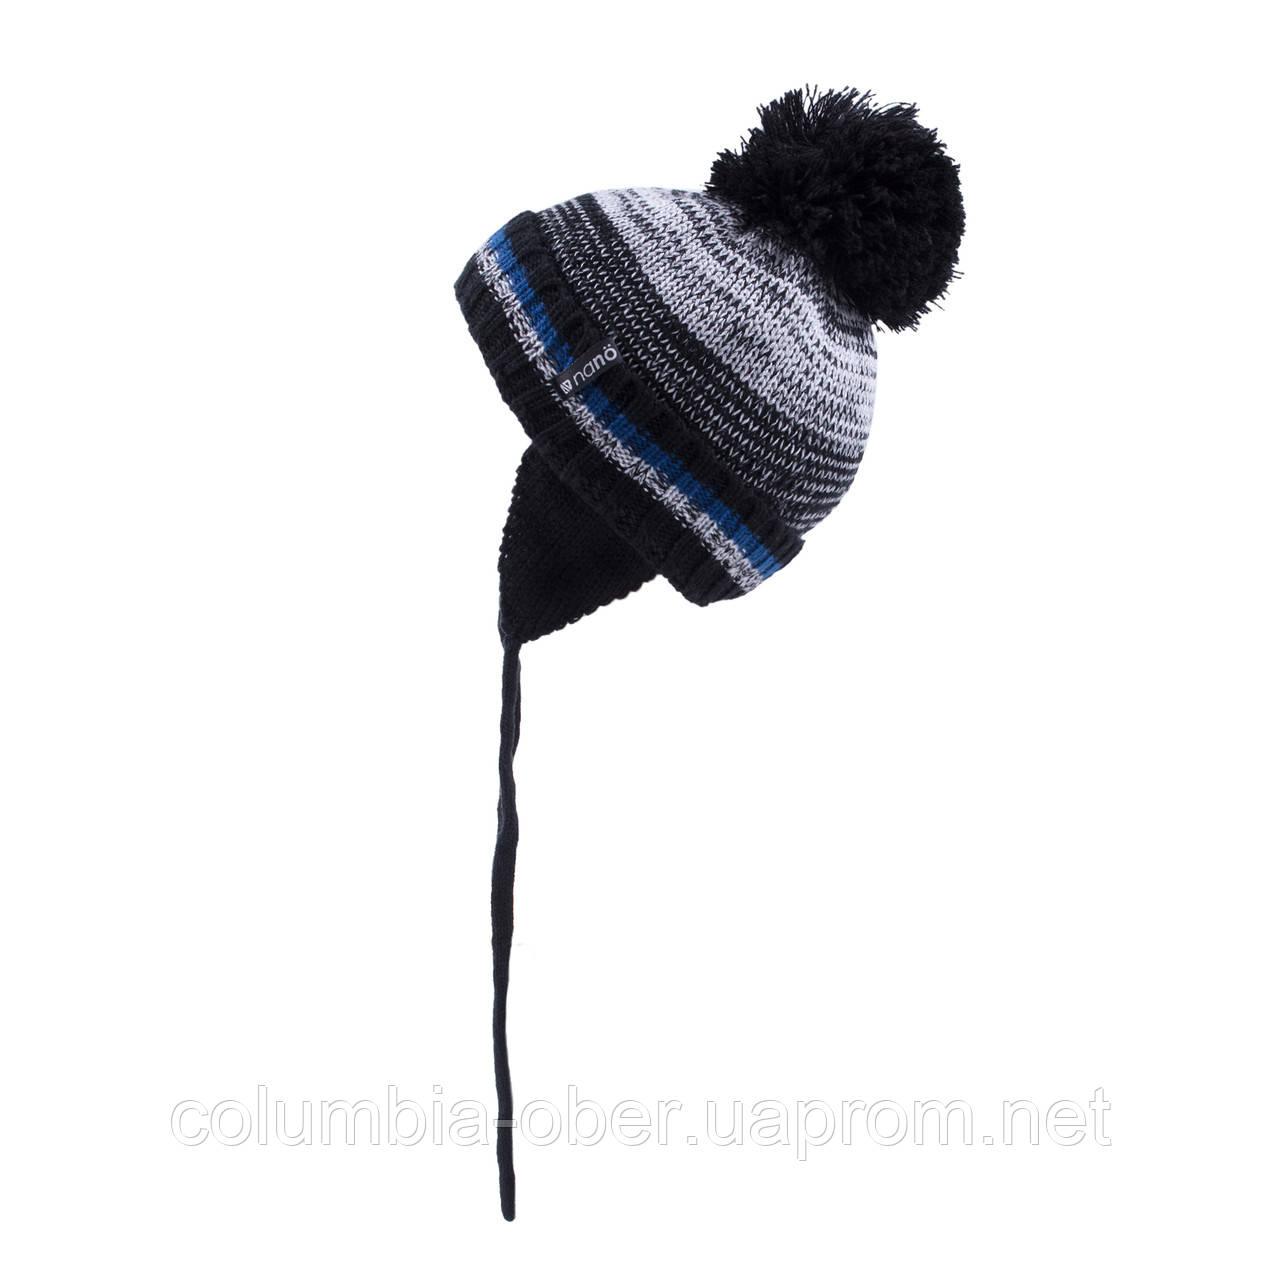 Зимняя шапка для мальчика Nano F19TU265 Black/DustGray. Размеры 2/4 и  5/6X.